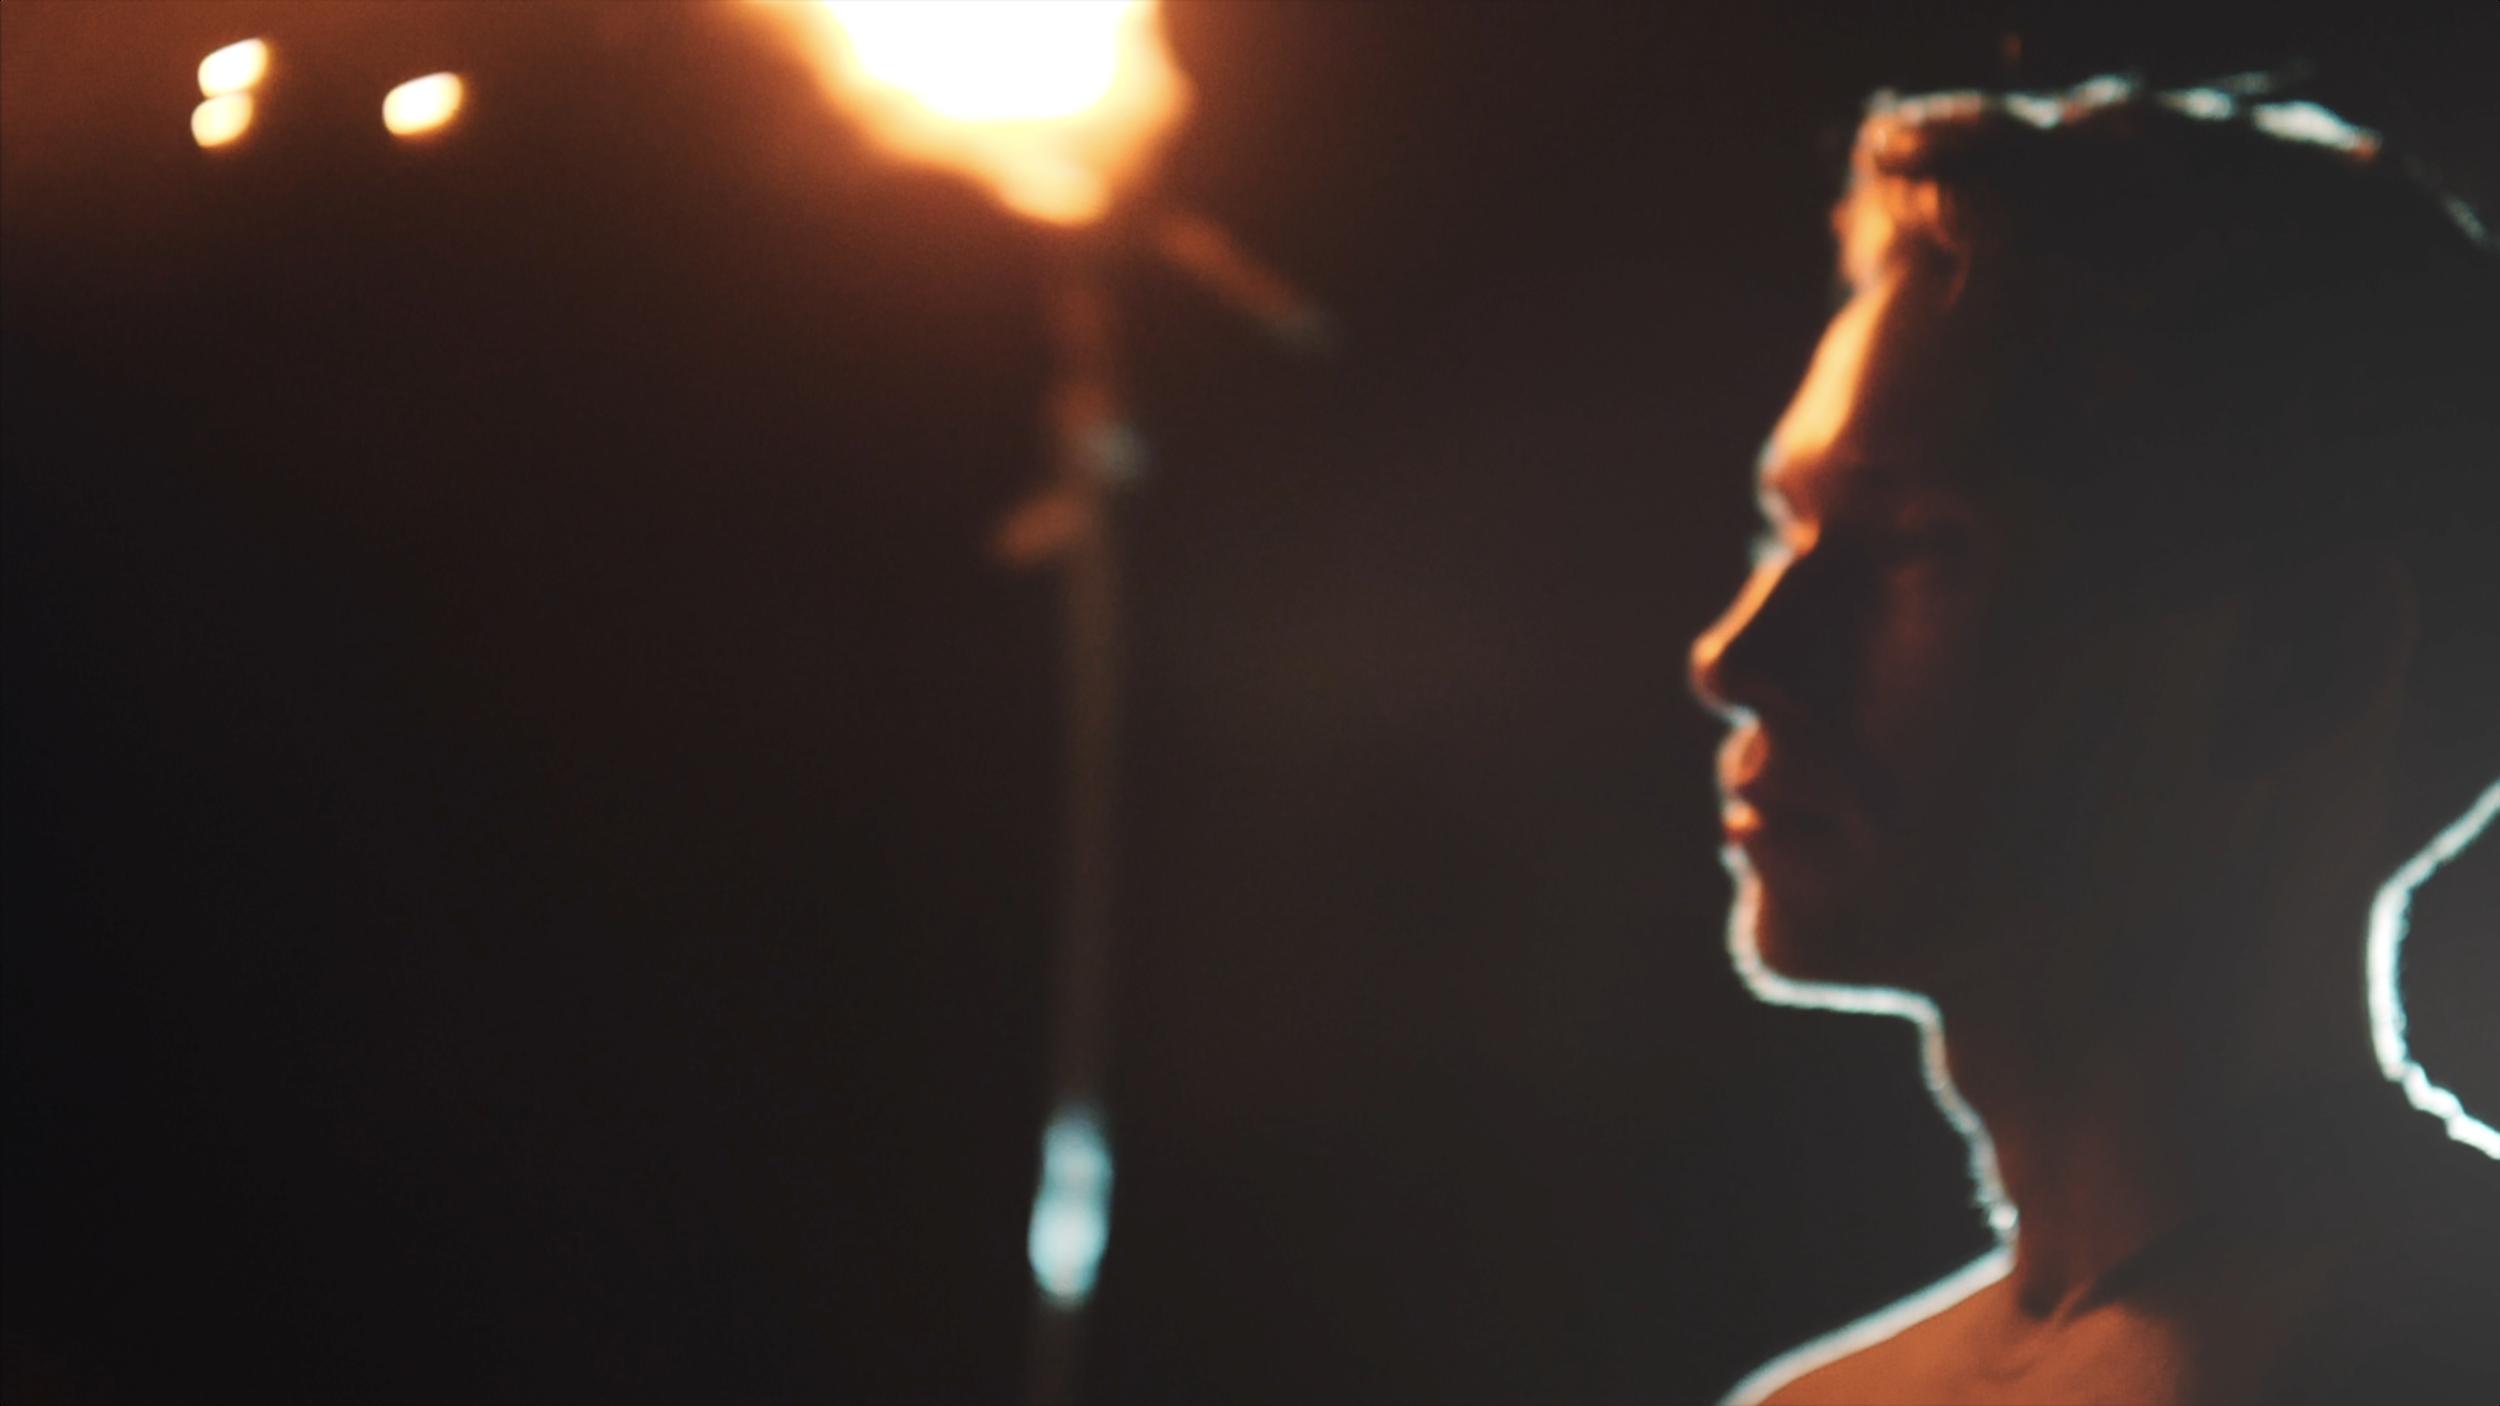 indie music video with steel wool sparkler